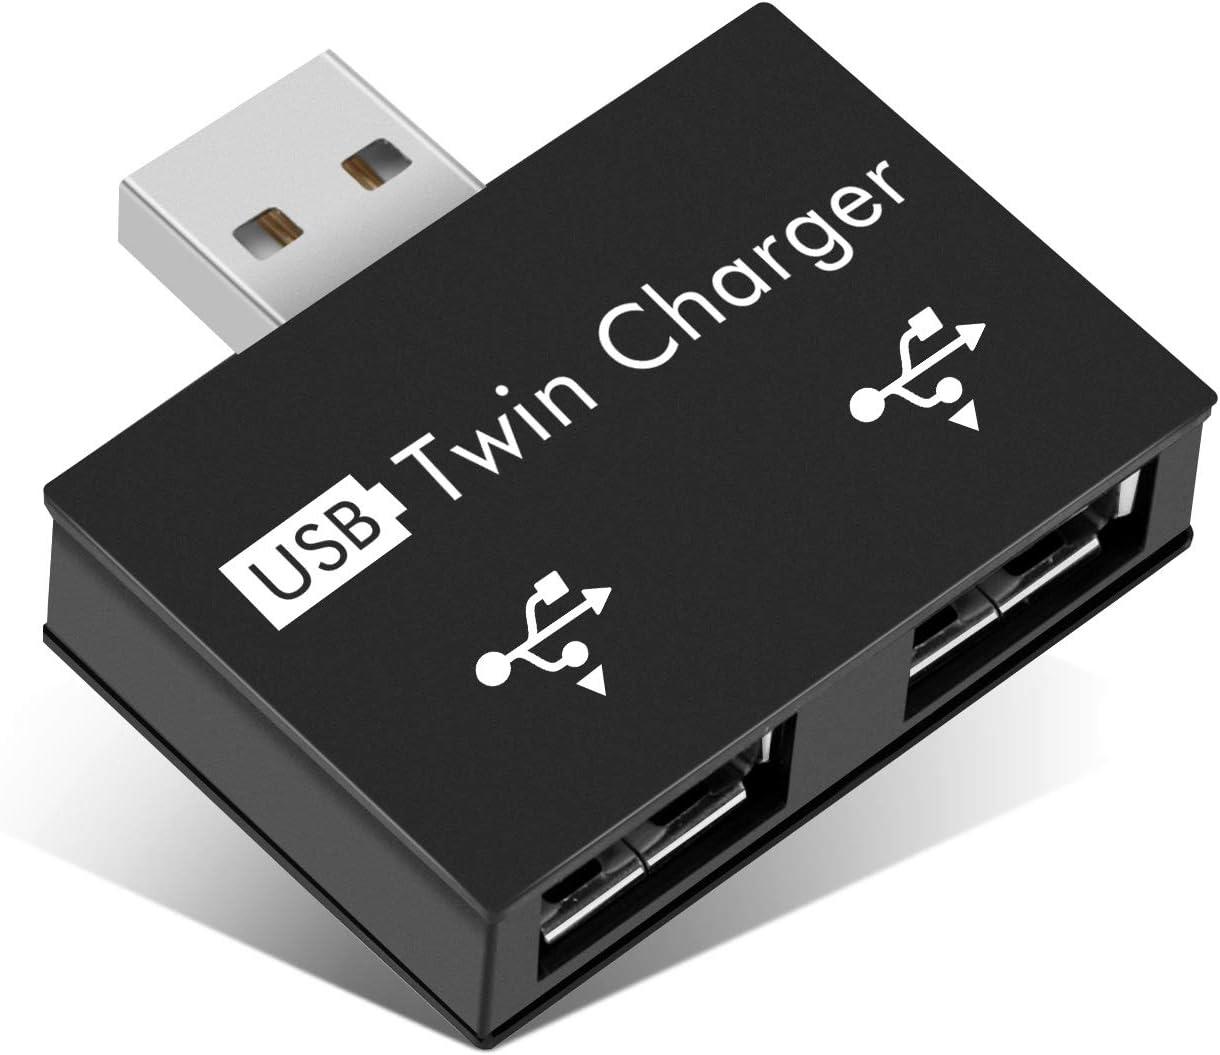 USB2.0 2-Port, Portable 2-Port USB Hub, Male to Dual USB Female Adapter for Laptops Desktops(Black)